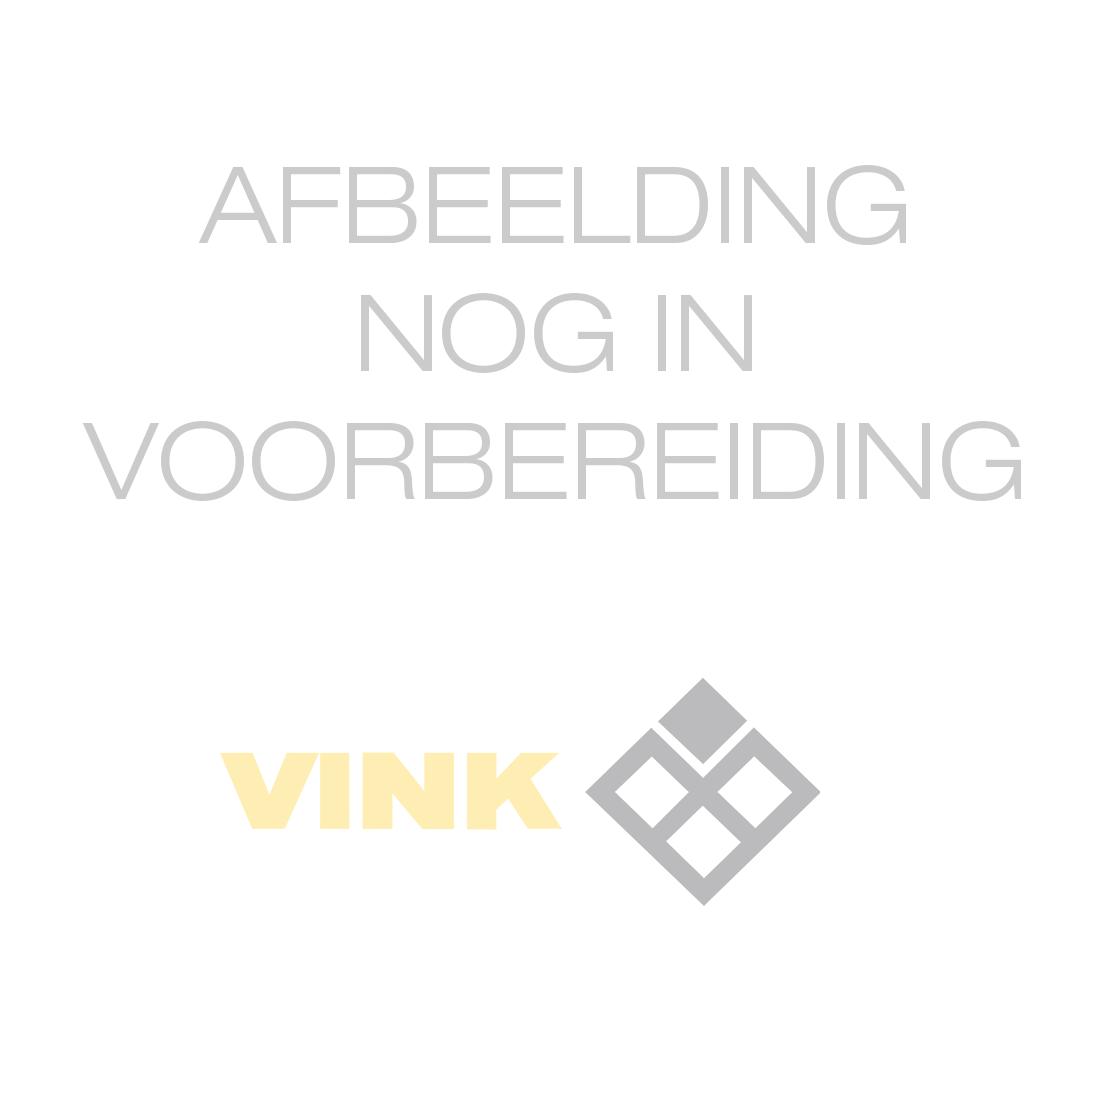 "GF FPM VLAKKE PAKKING TBV 3-DELIGE KOPPELING d20 -1/2"" 749400006"